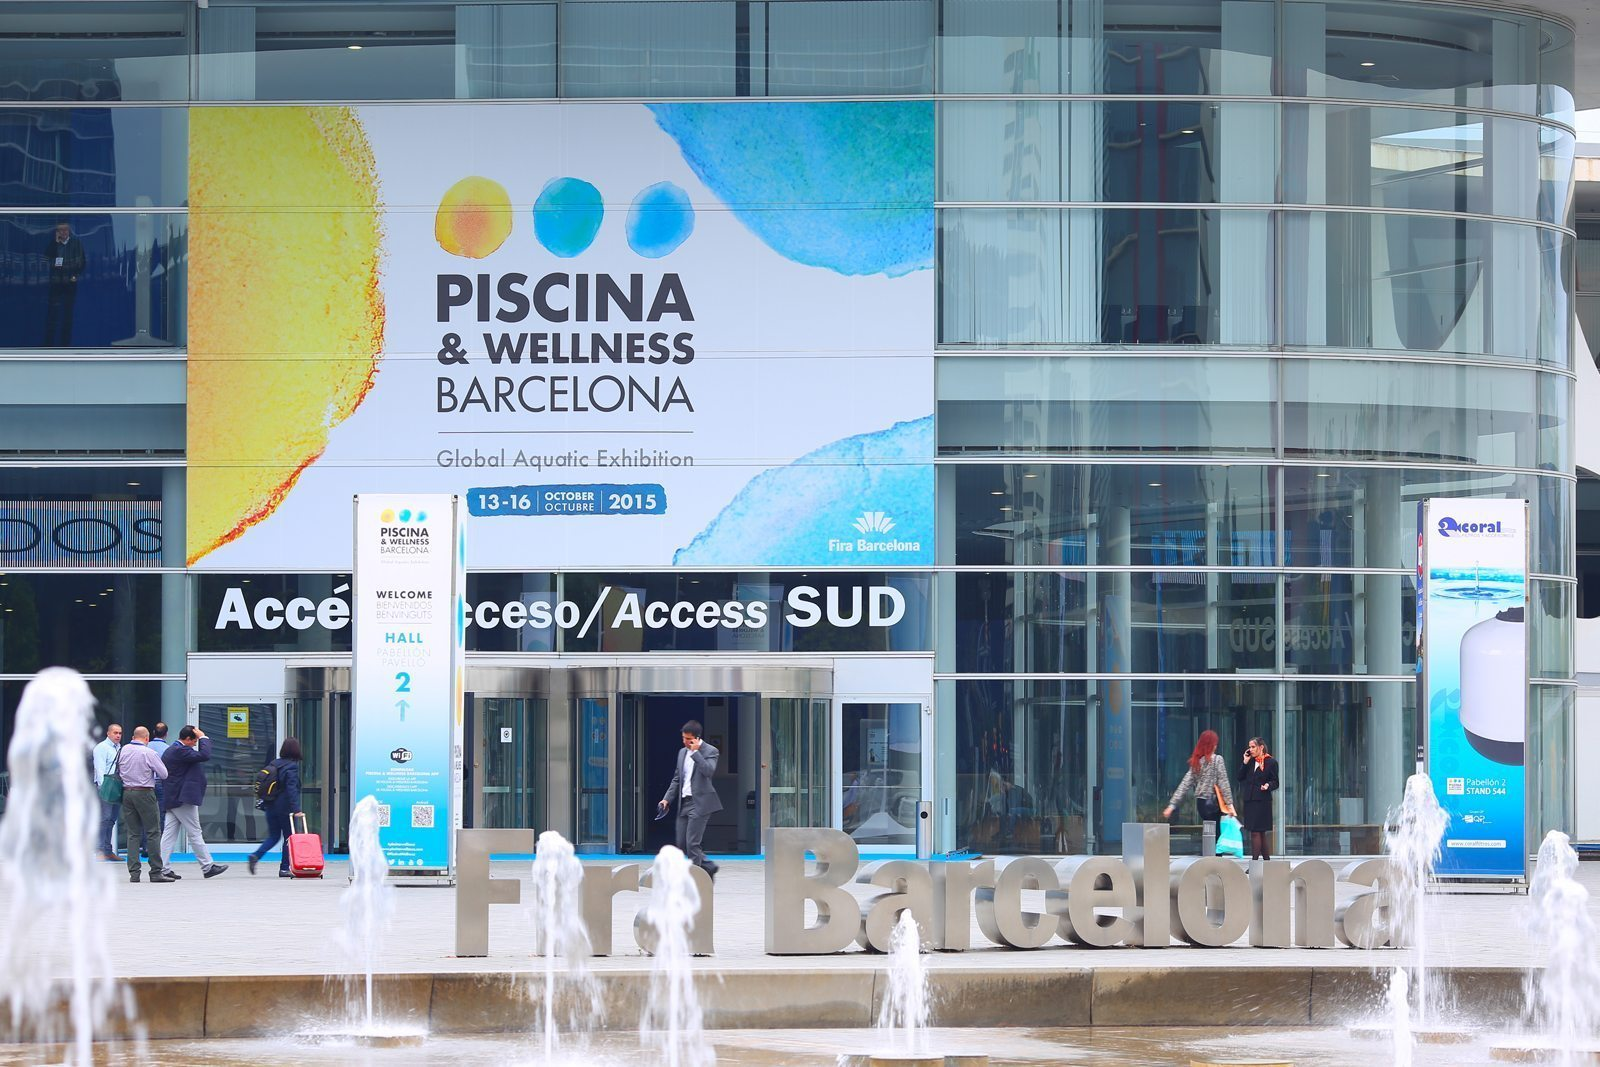 Piscina & Wellness Barcelona 2015